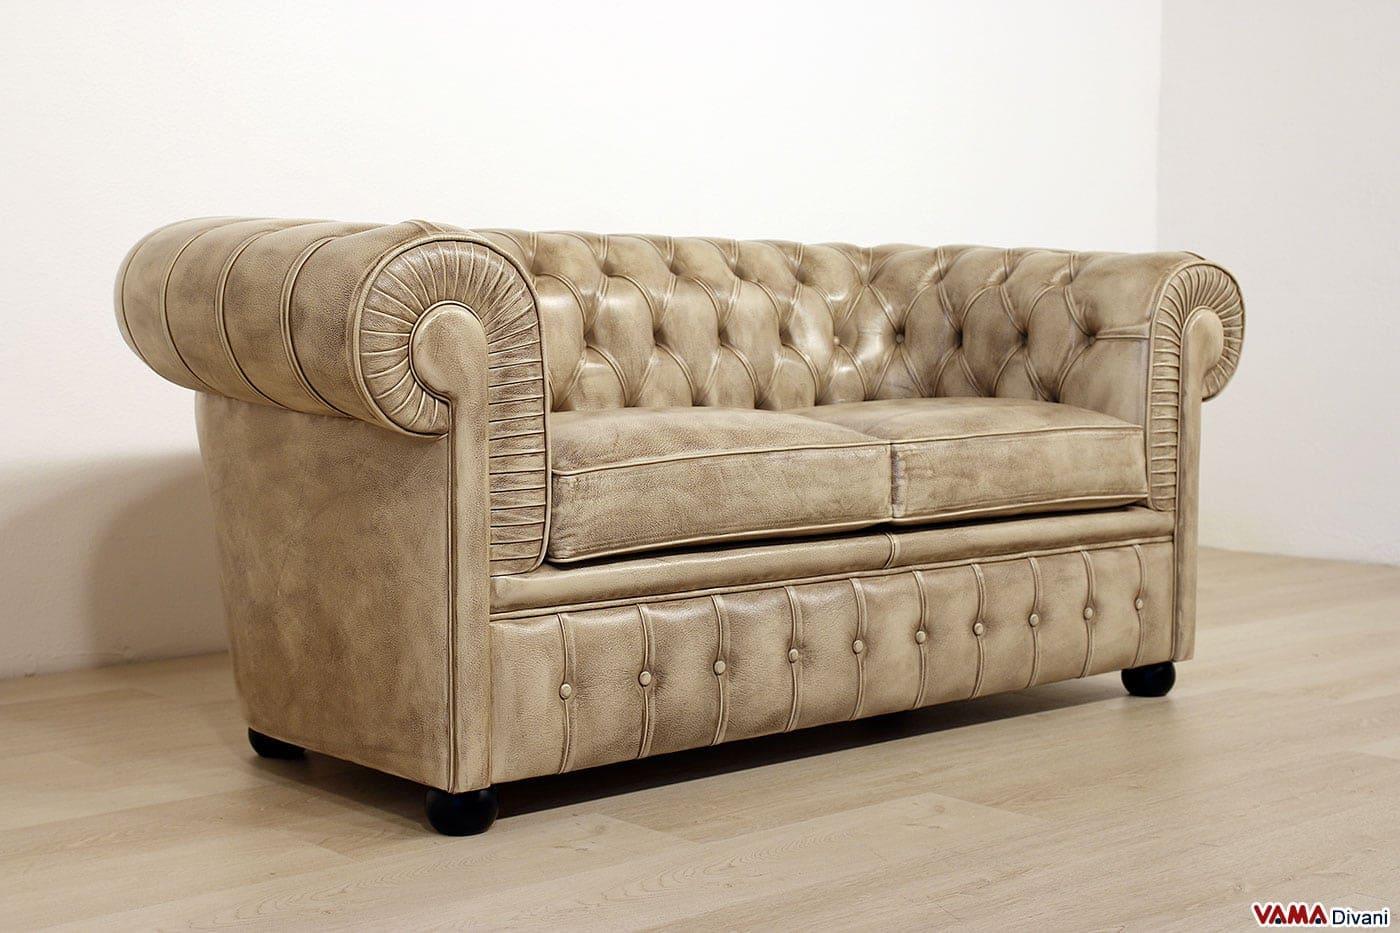 Divano 2 posti misure materasso divano posti xl cm - Divano 4 posti misure ...